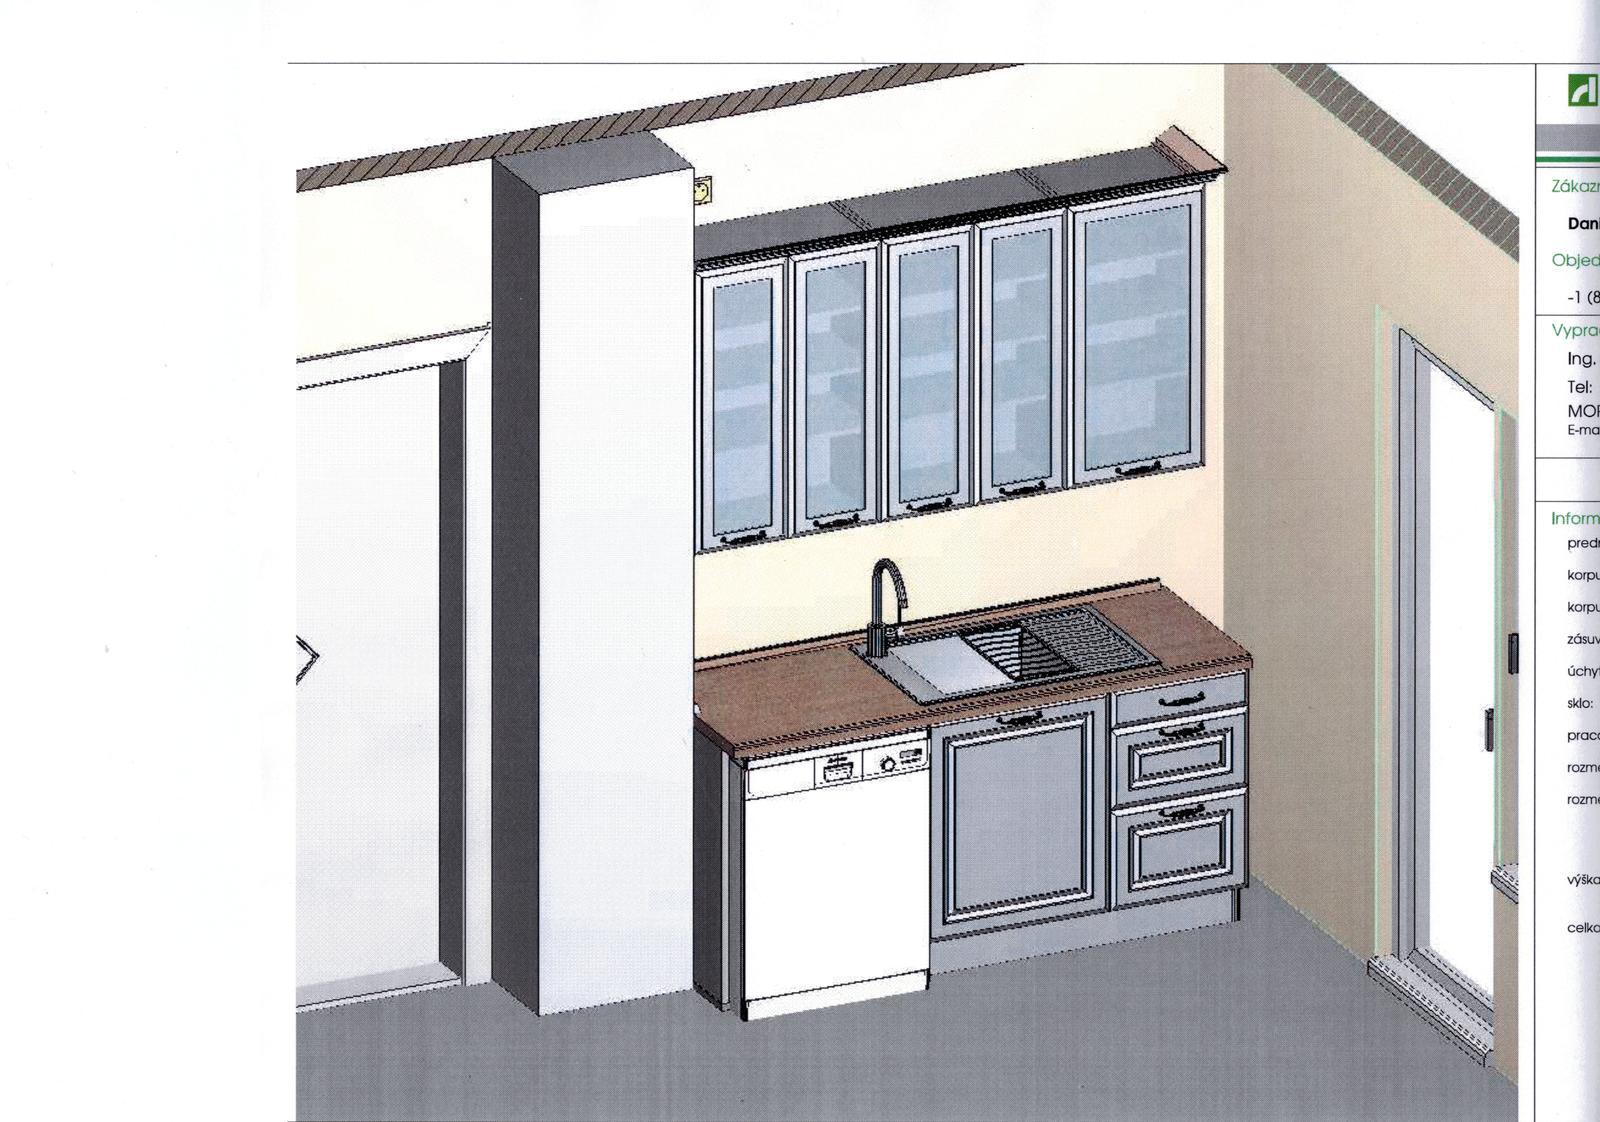 Dalsi level - zo stareho skoro nove - vizualizacia kuchynskej linky - decodom katy biela (aj ked to vo vizualizacii nevyzera)